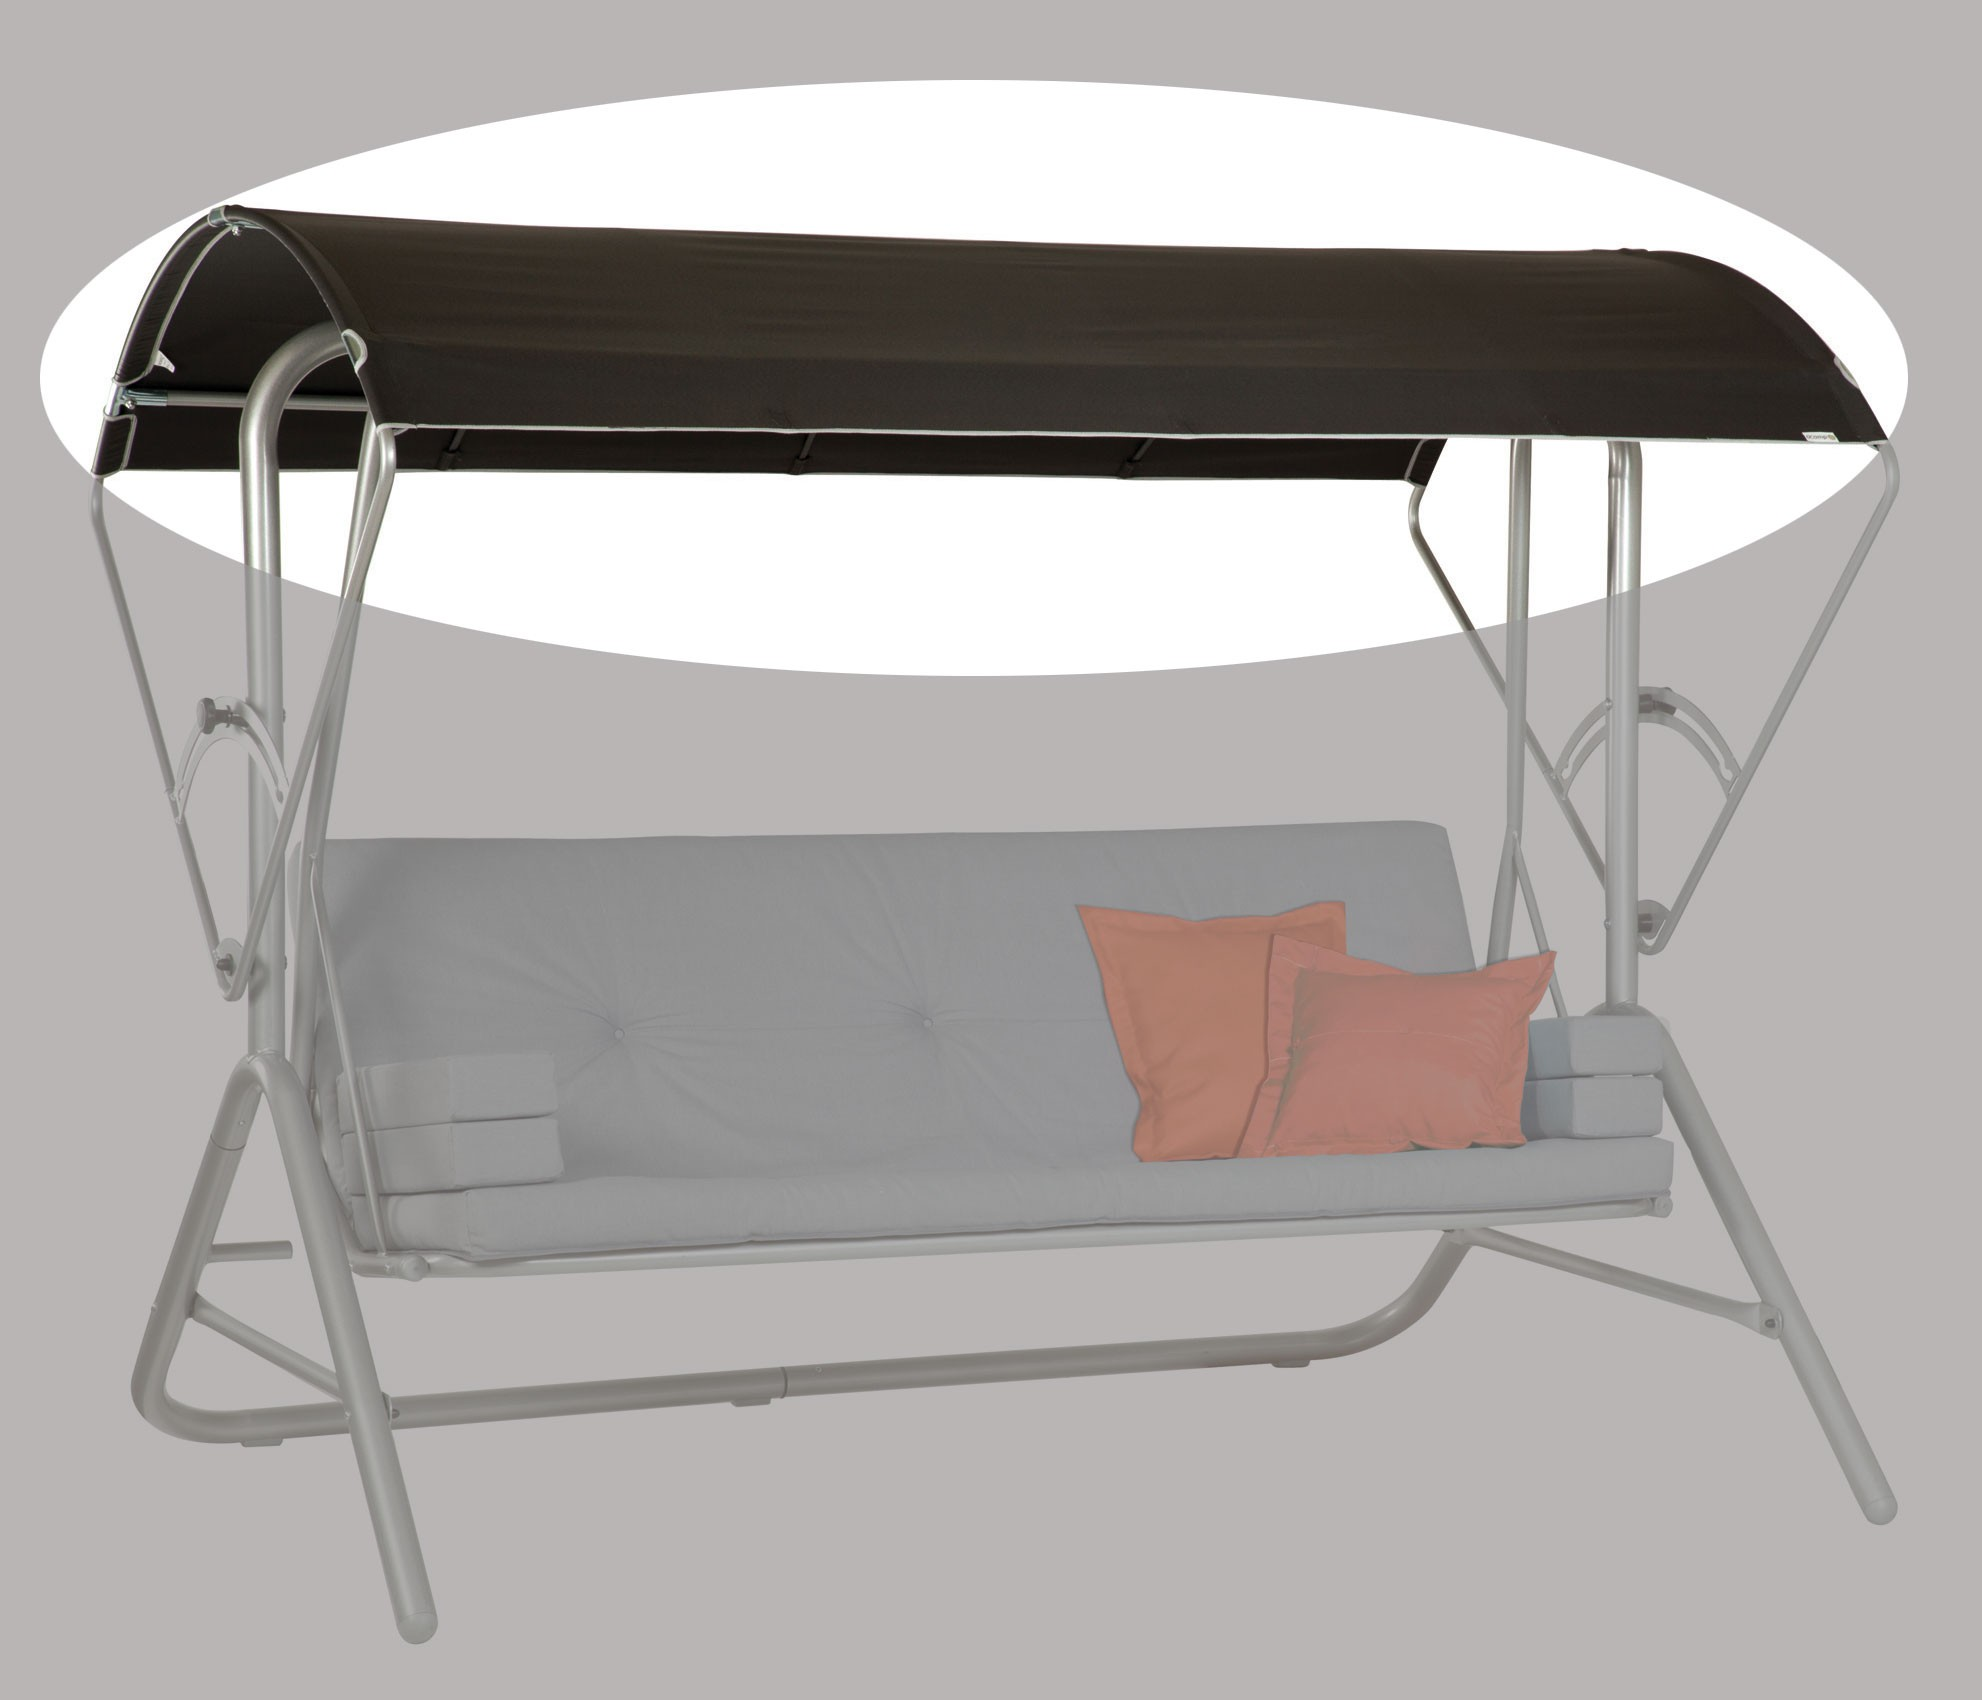 acamp hollywoodschaukel ersatzdach schwimmbadtechnik. Black Bedroom Furniture Sets. Home Design Ideas